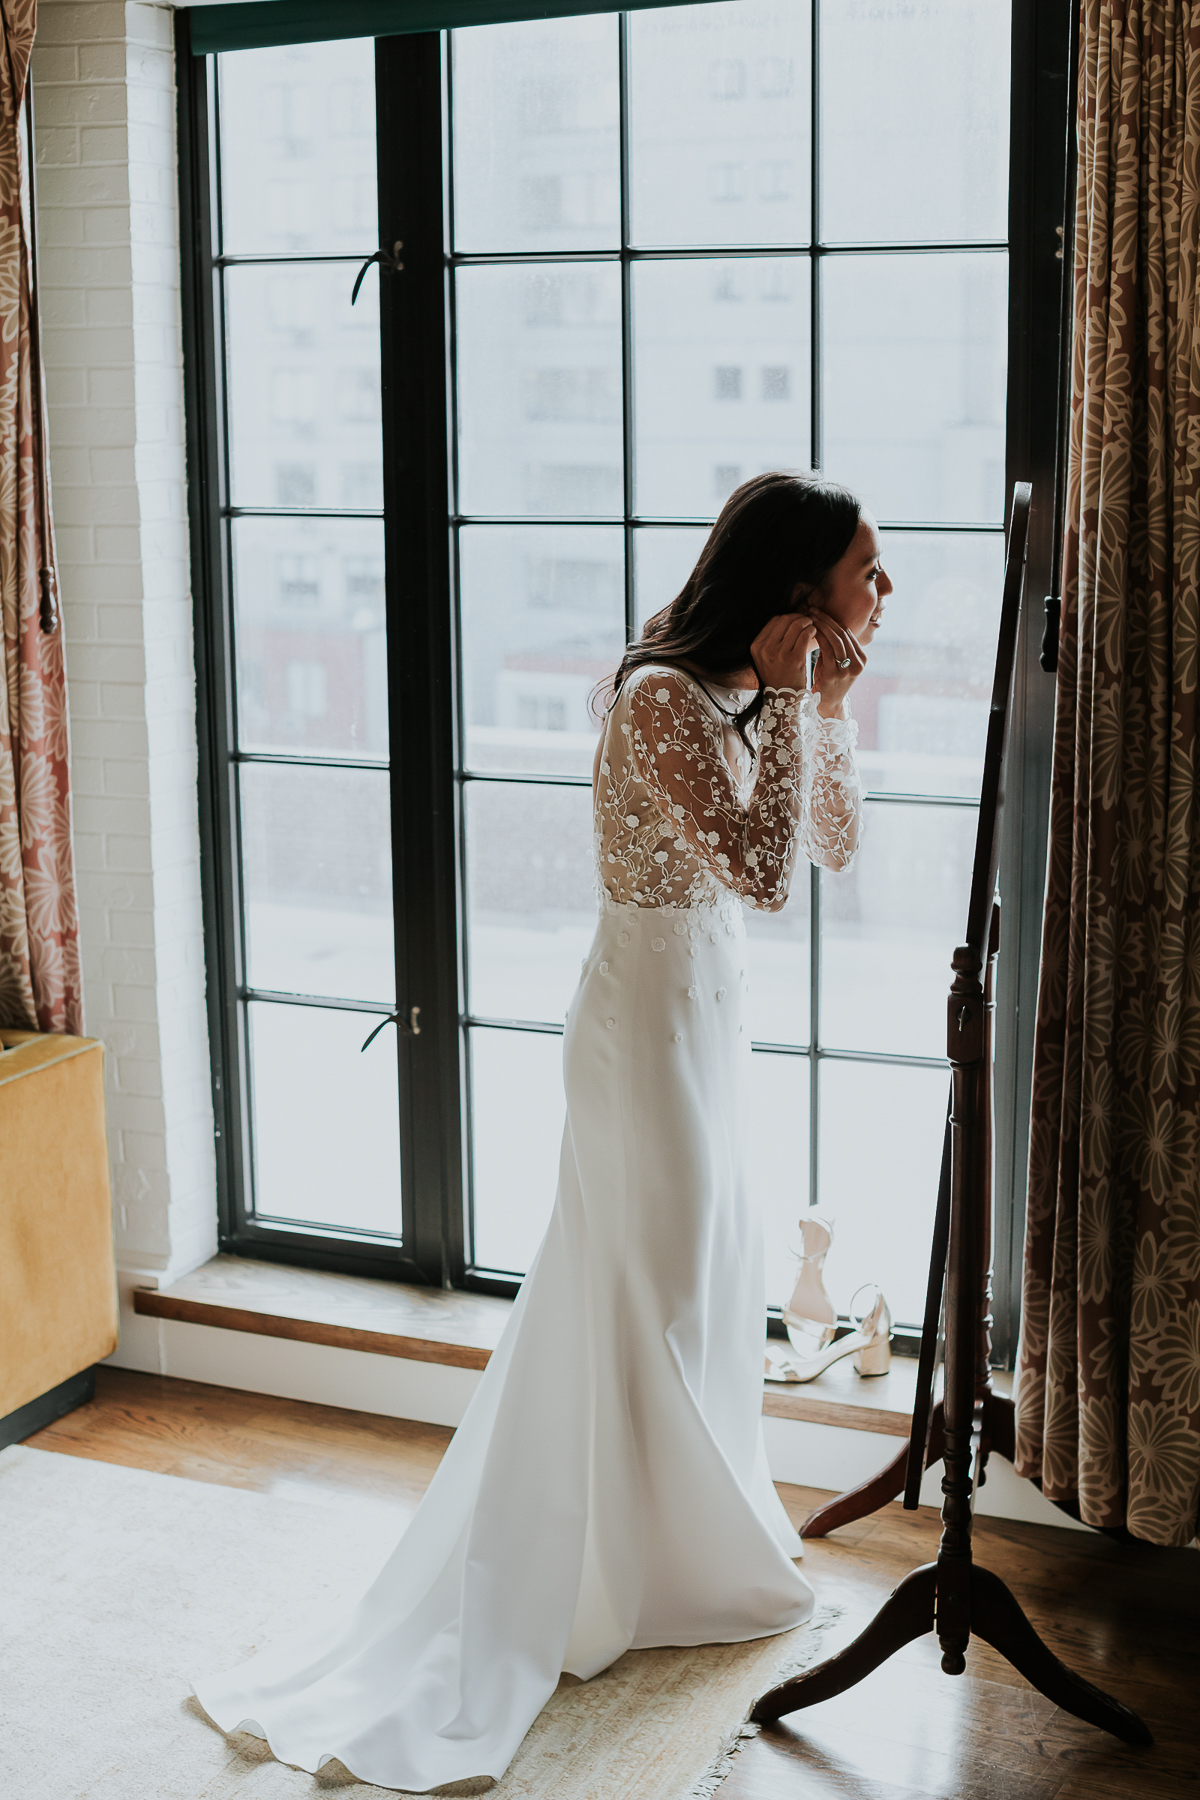 Bowery-Hotel-NYC-Documentary-Wedding-Photos-12.jpg